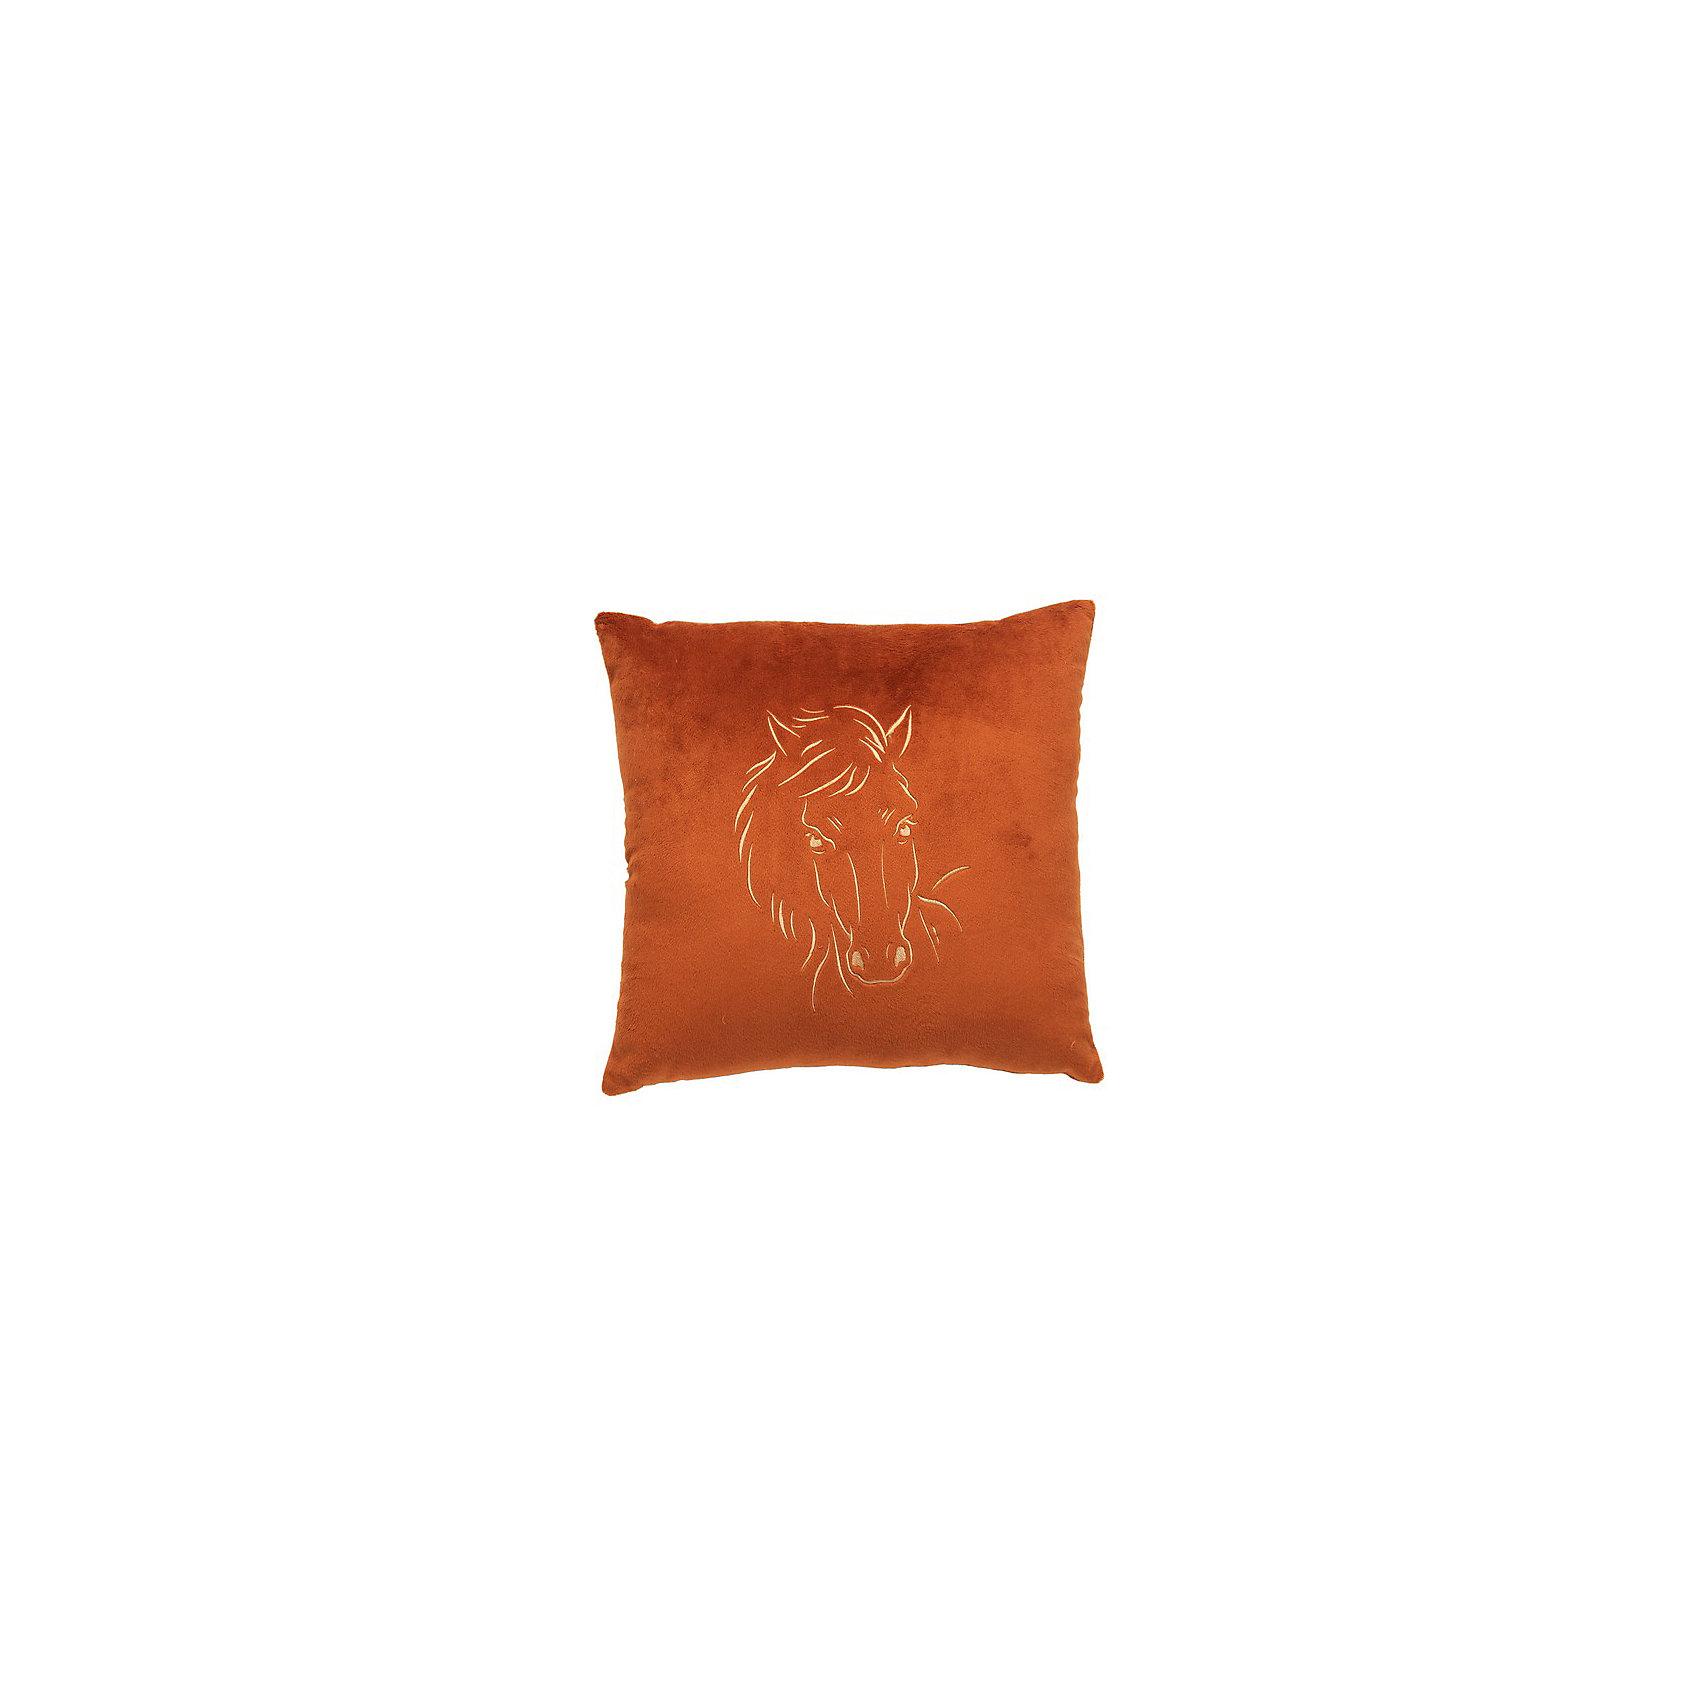 Декоративная подушка Лошадь арт. 1845-1, Small Toys, коричневый